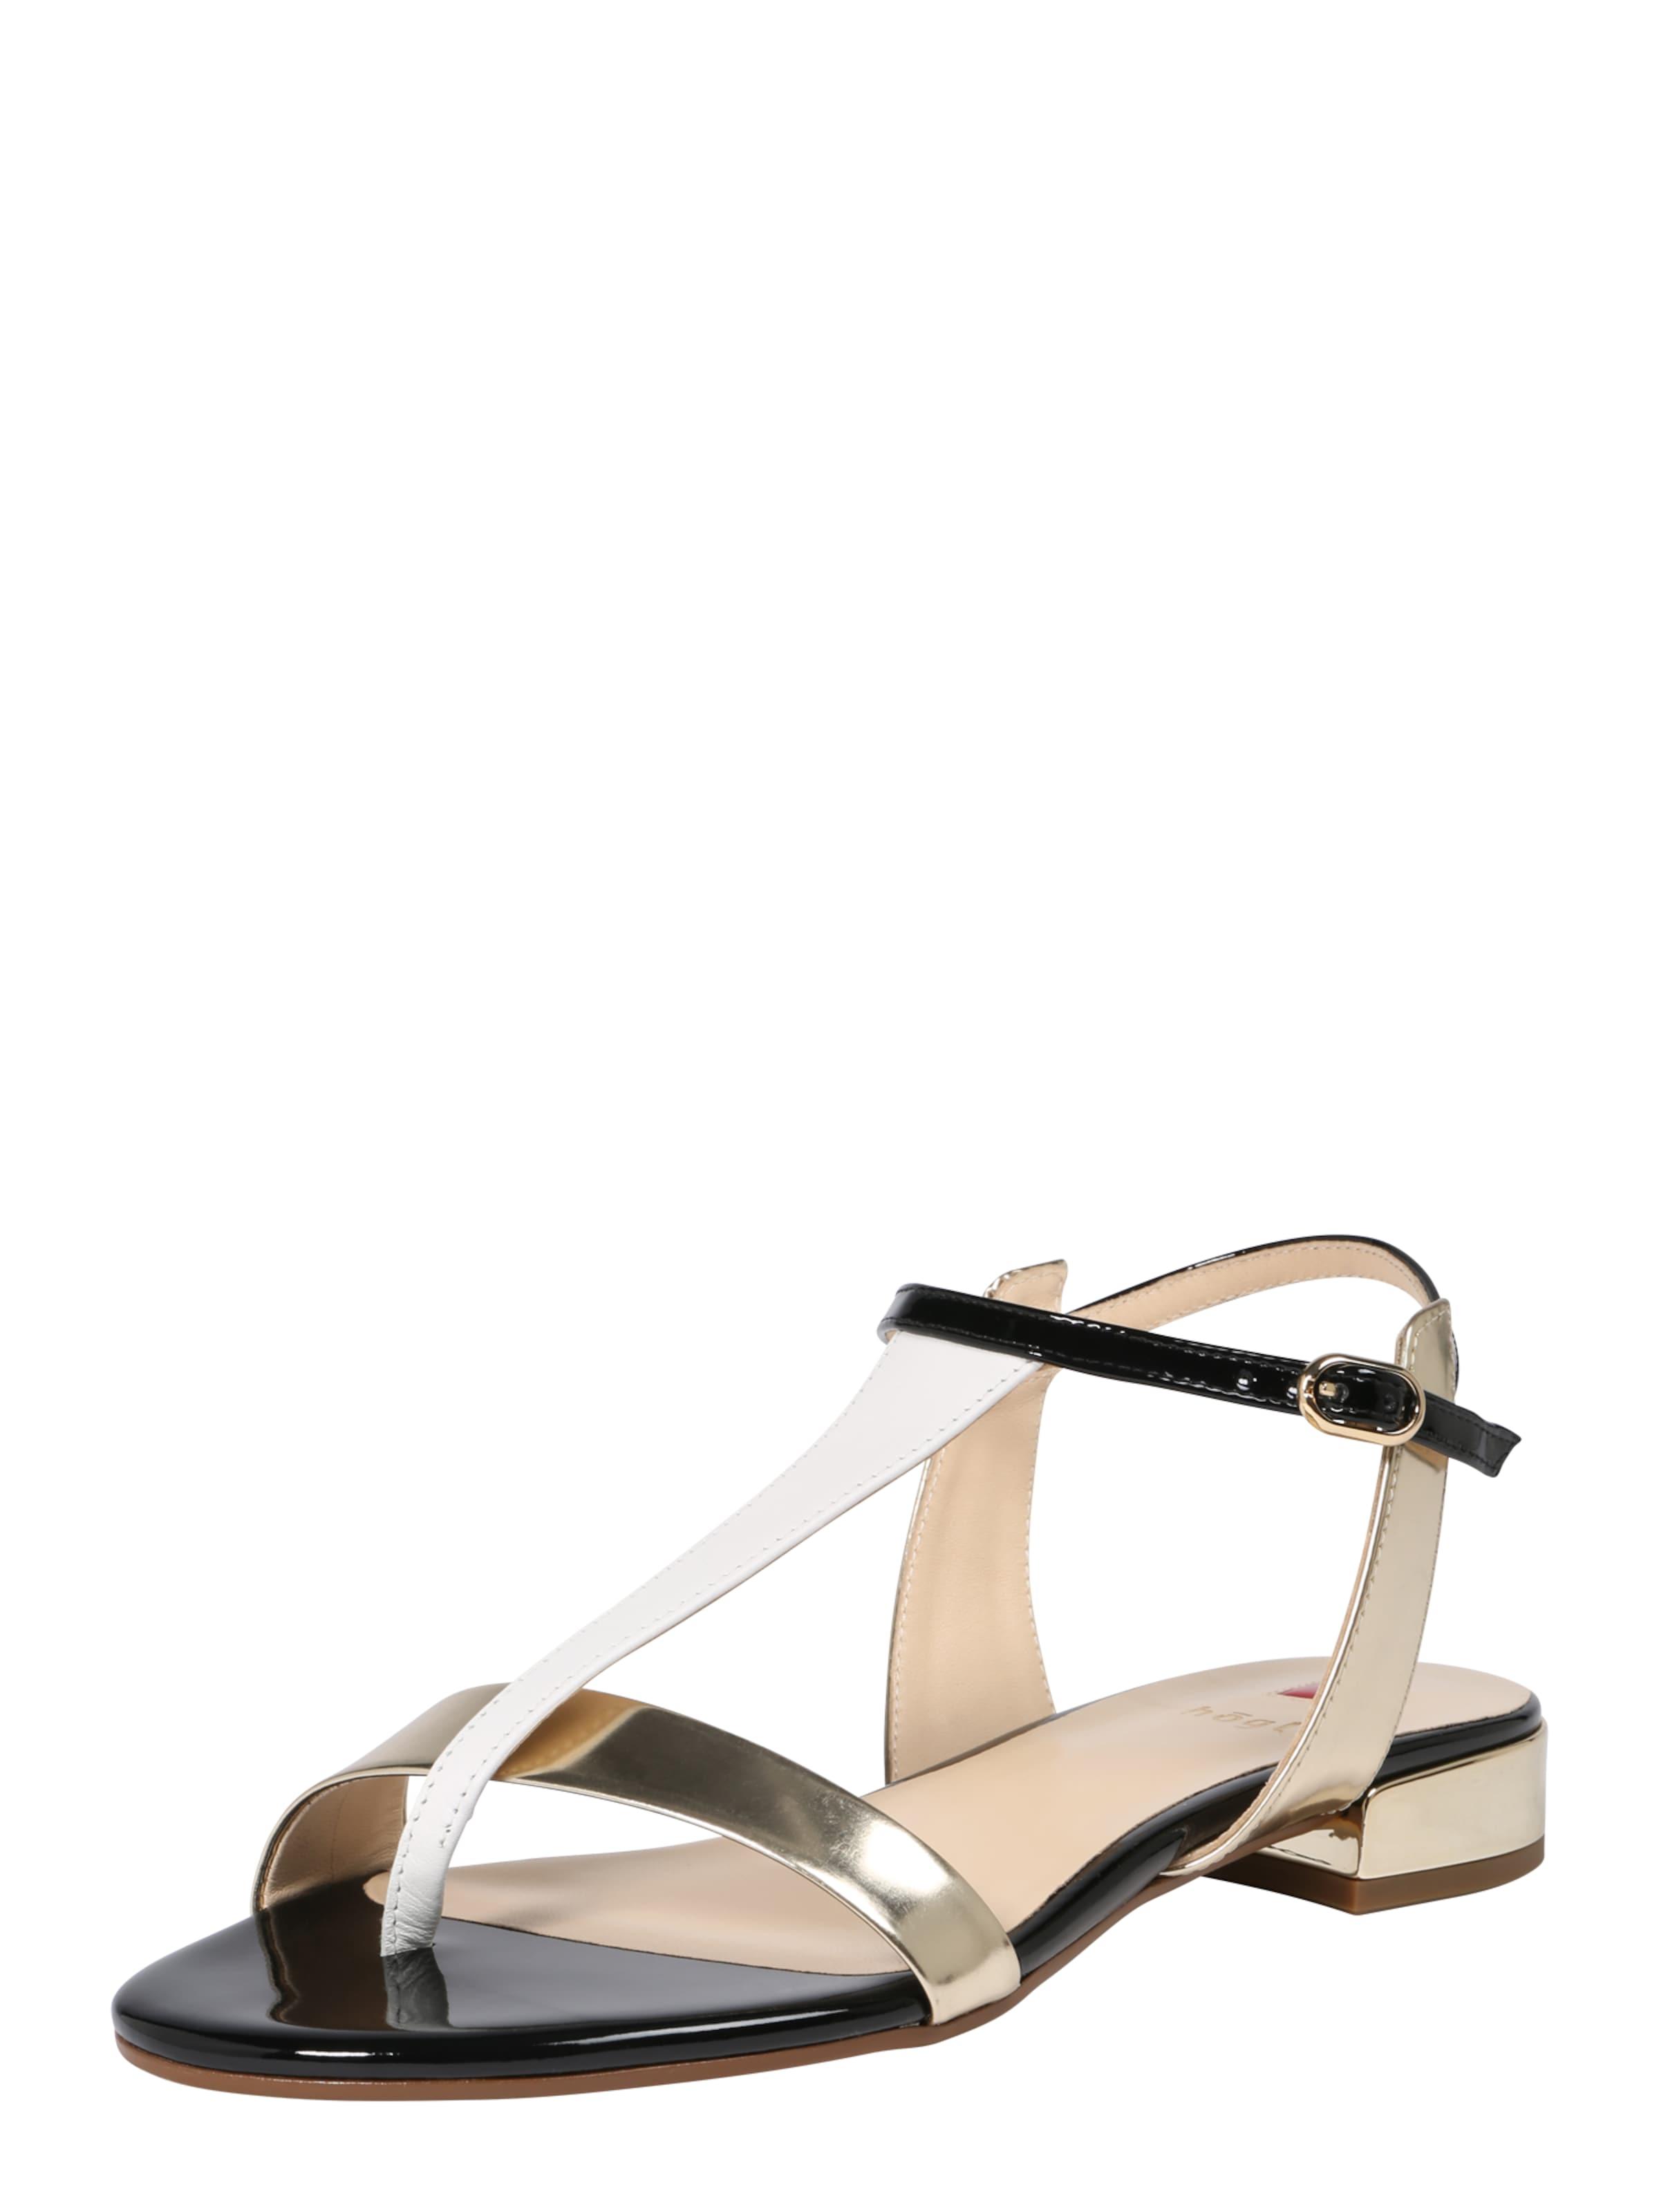 Haltbare Mode billige Schuhe Högl | Sandale 'Platin Multi' Schuhe Gut getragene Schuhe